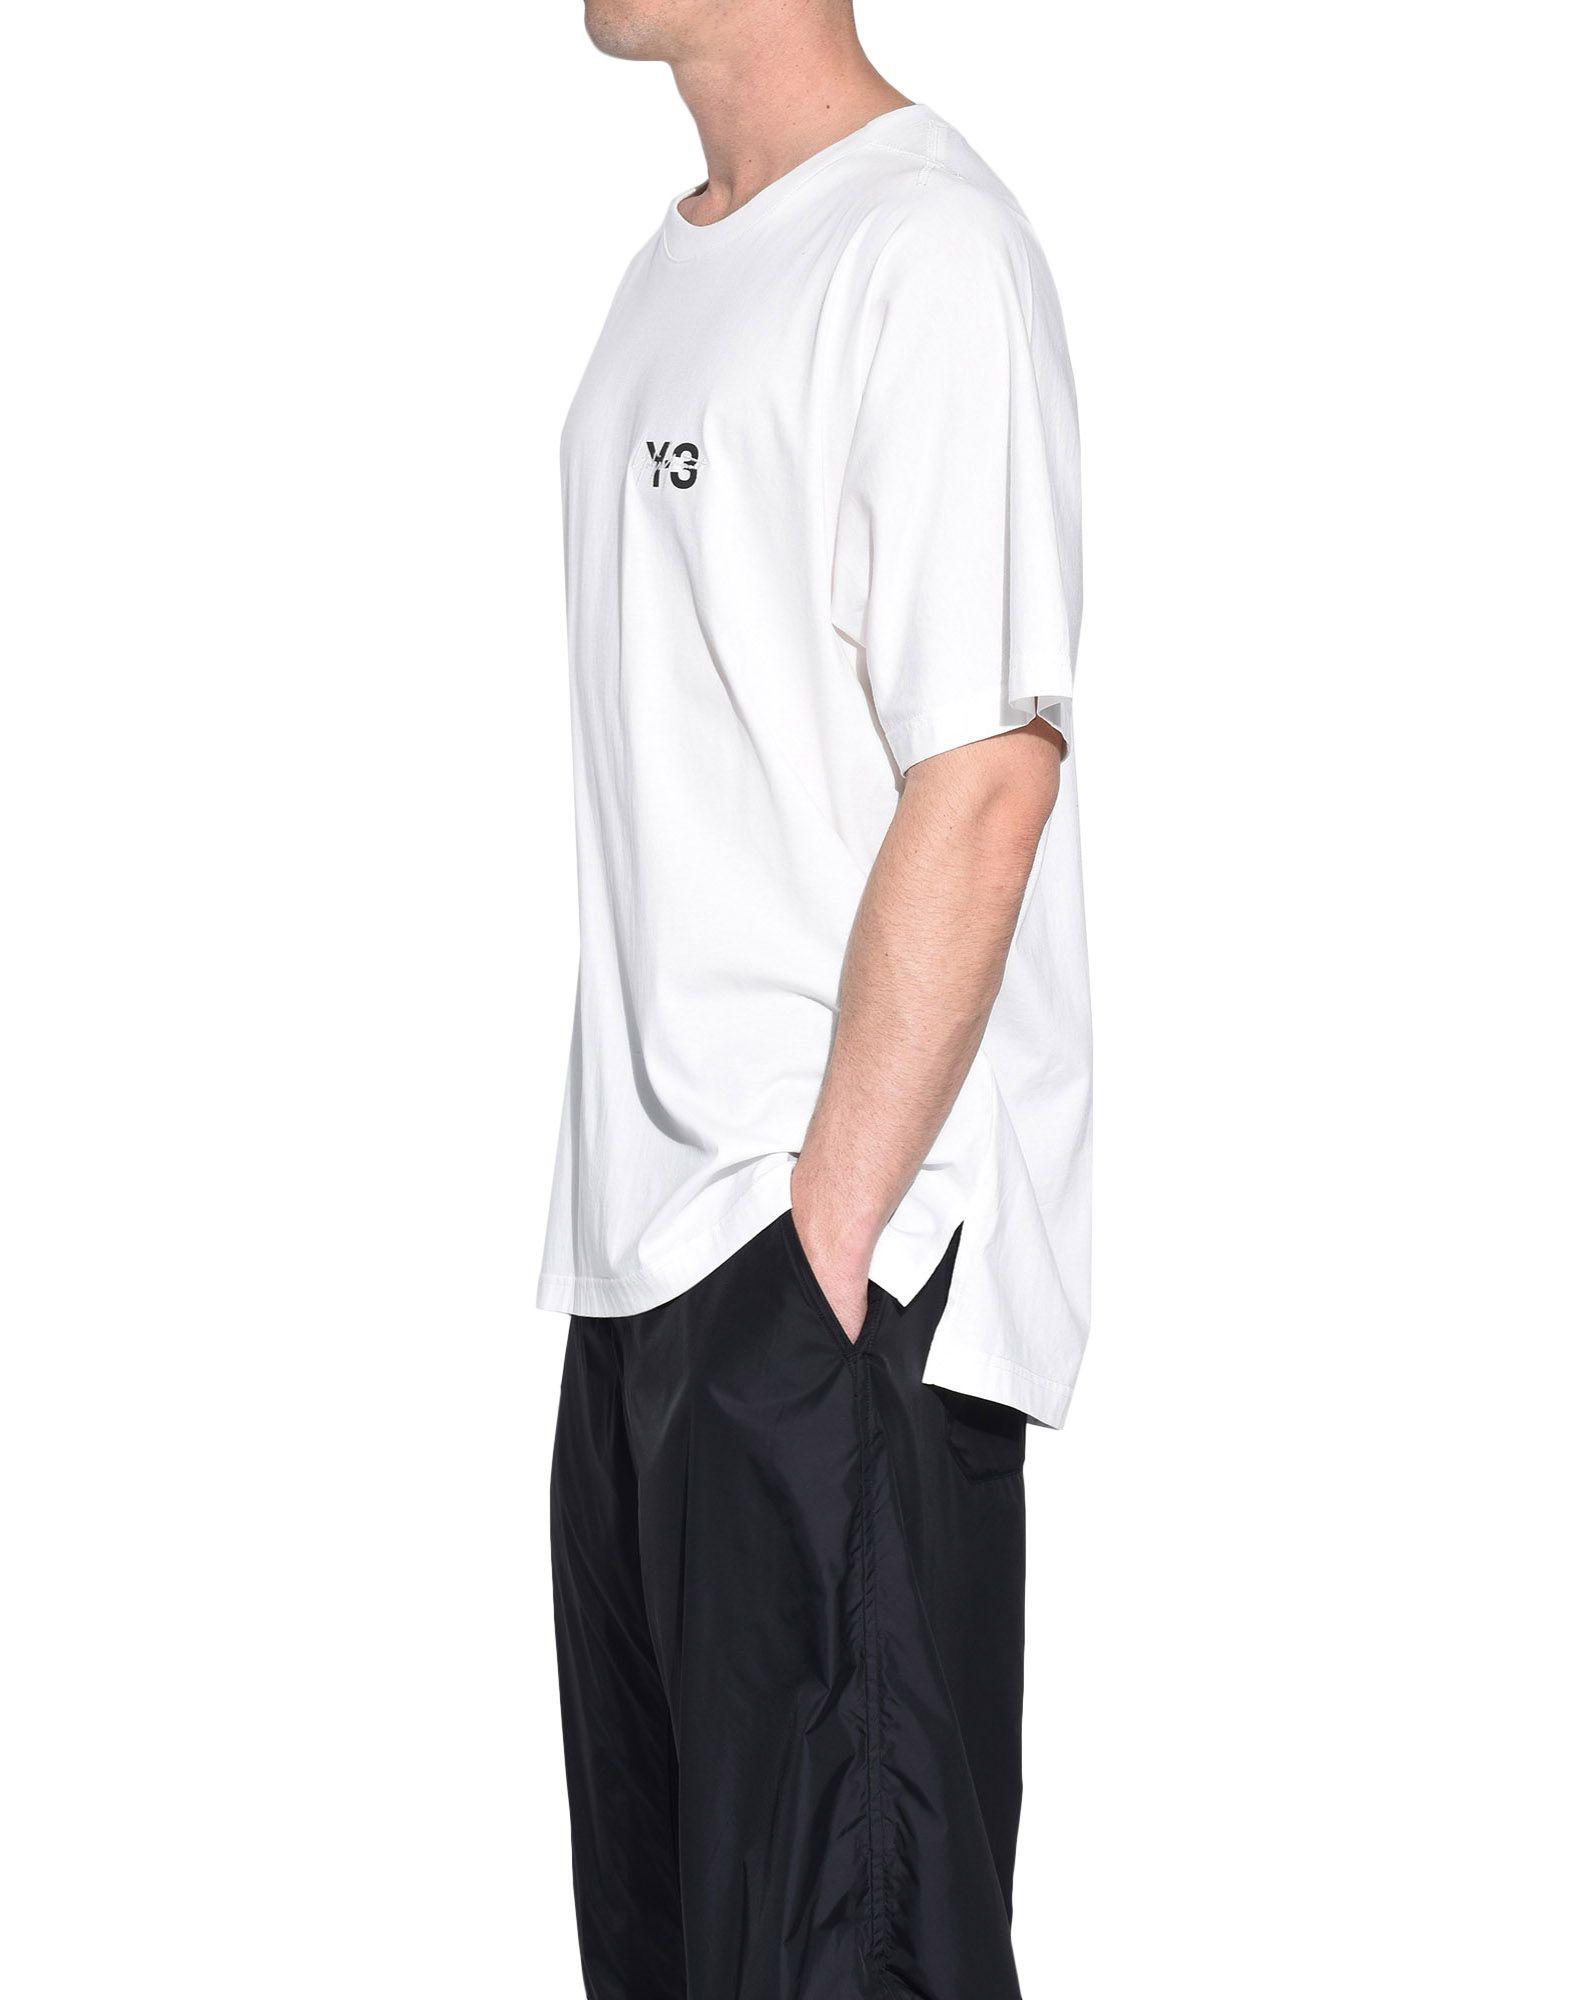 Y-3 Y-3 Signature Tee Short sleeve t-shirt Man e